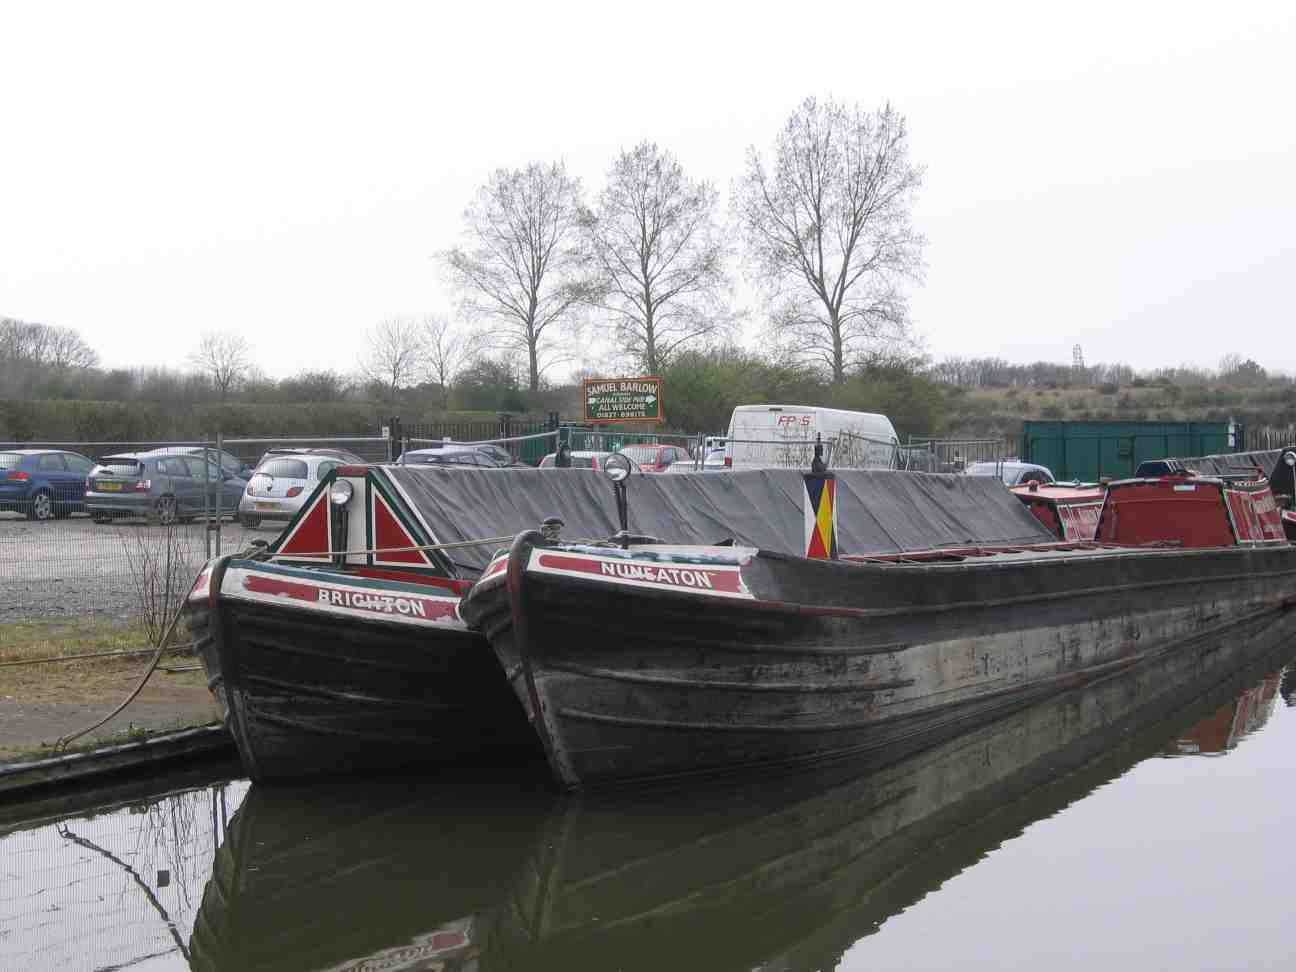 Narrowboat Densie: Tamworth And Fazeley Junction